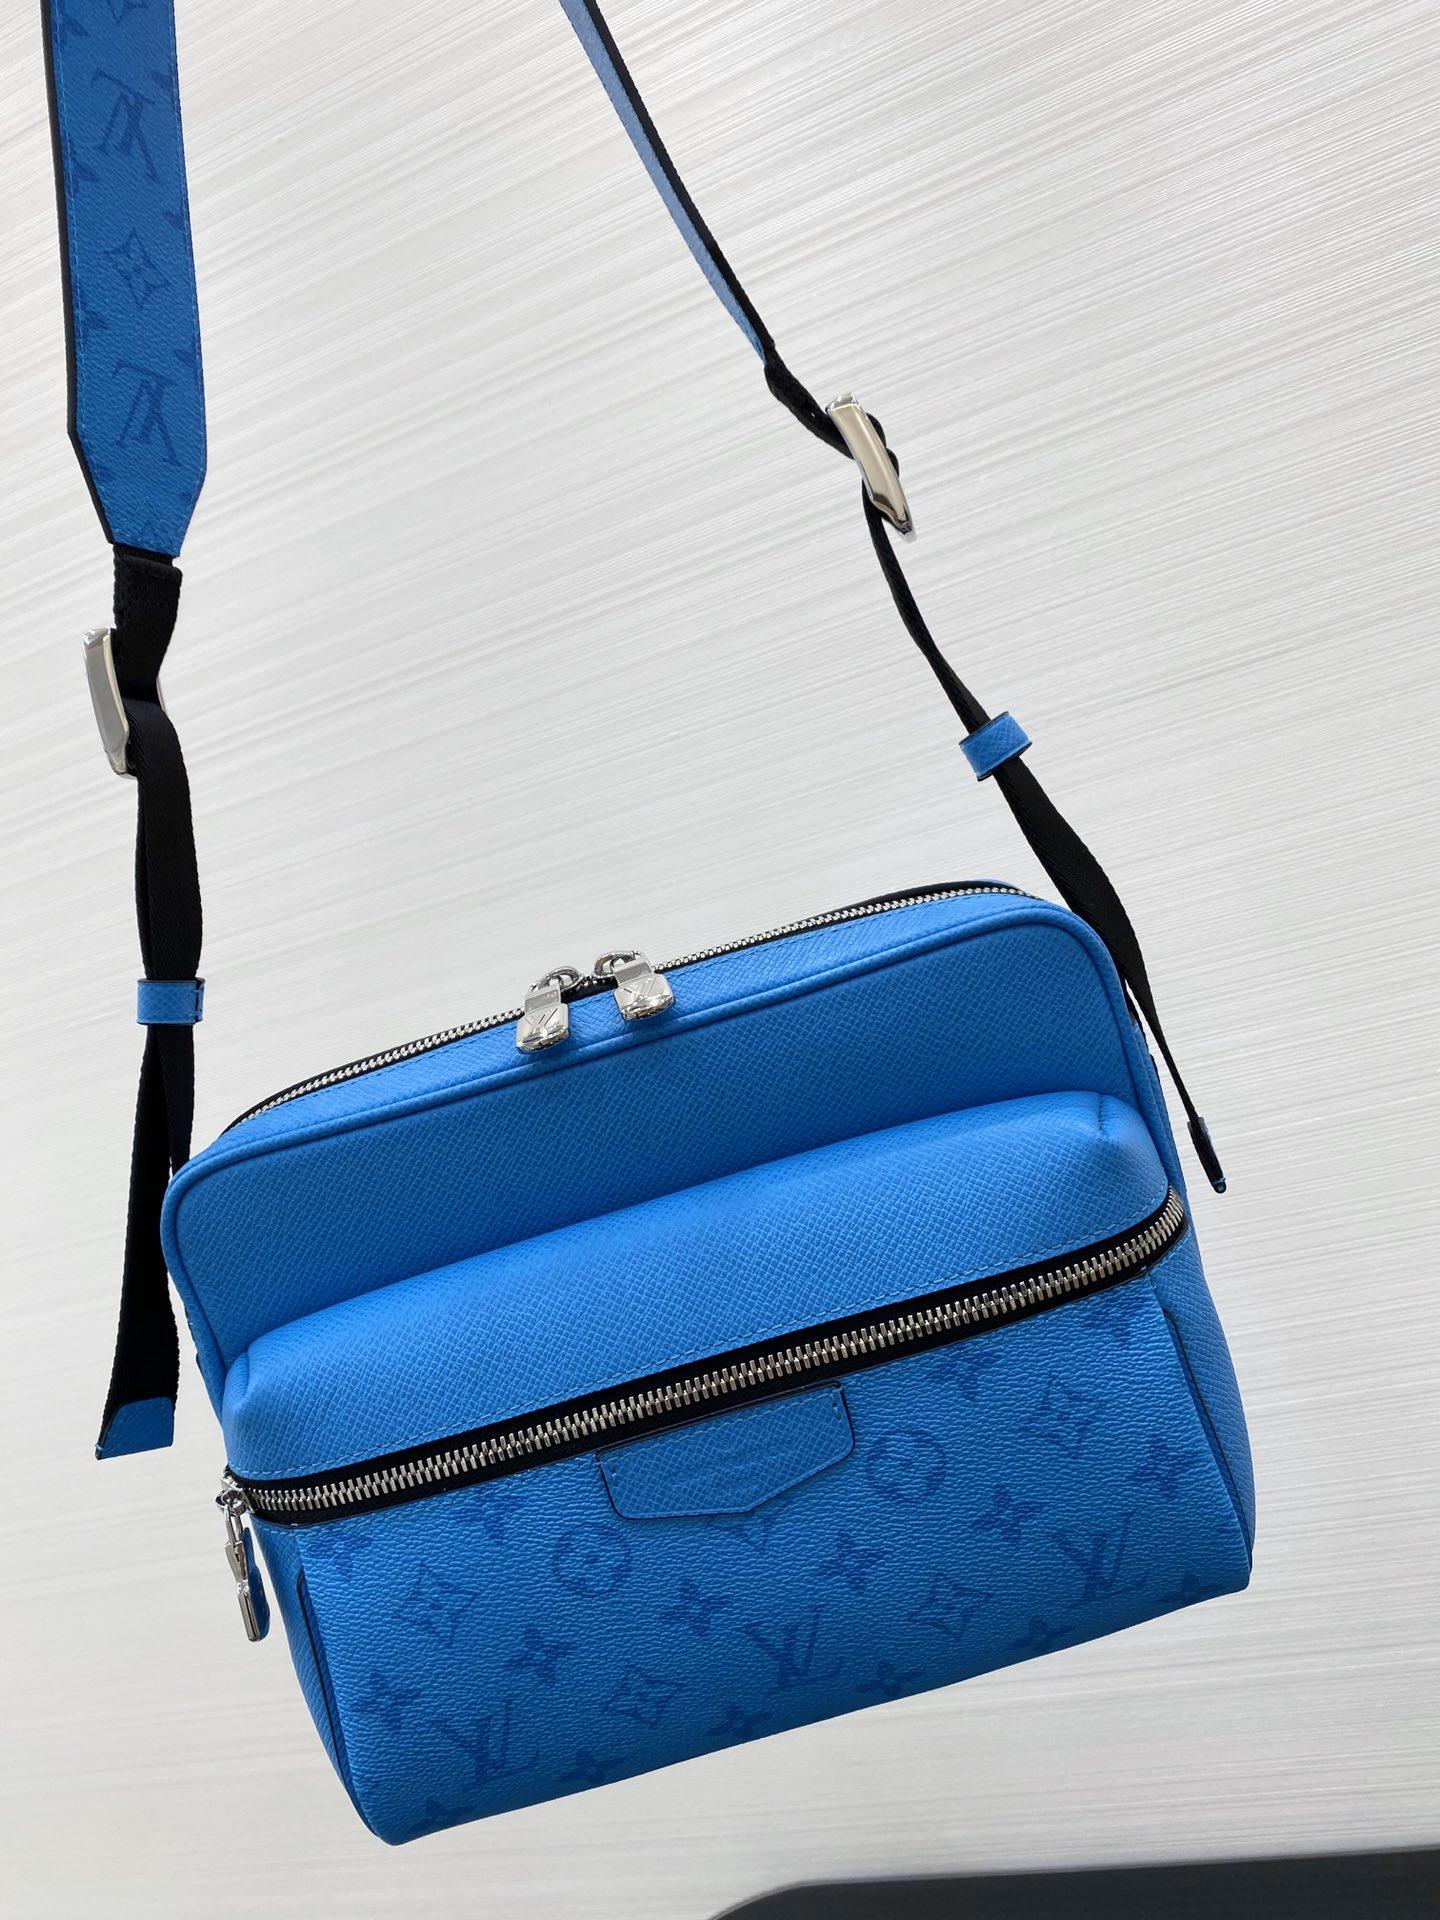 LV最新Taigarama系列新色荧光蓝43843 结合了品牌经典的taiga皮质和Monogram帆布